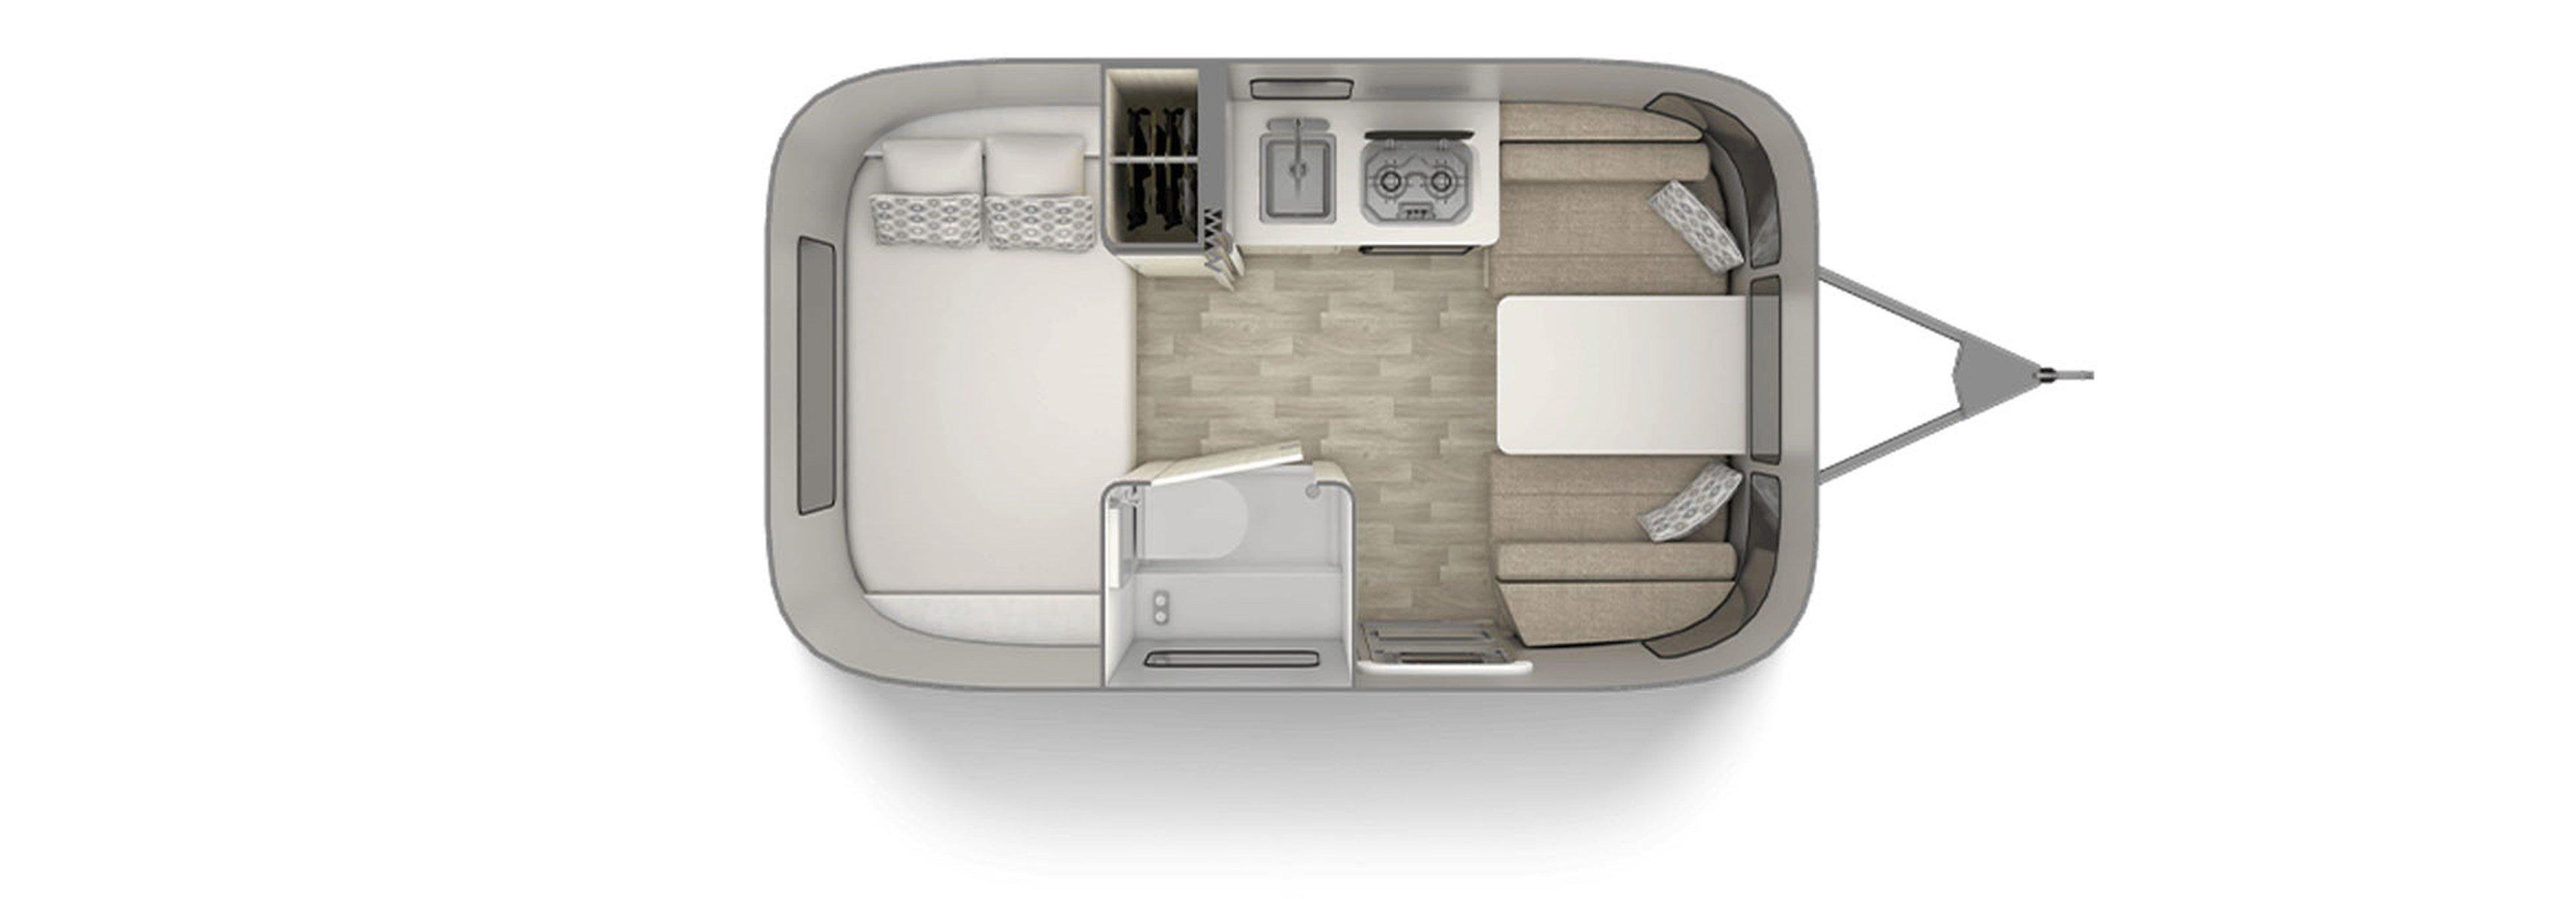 2020 Airstream Bambi 16RB Thumbnail